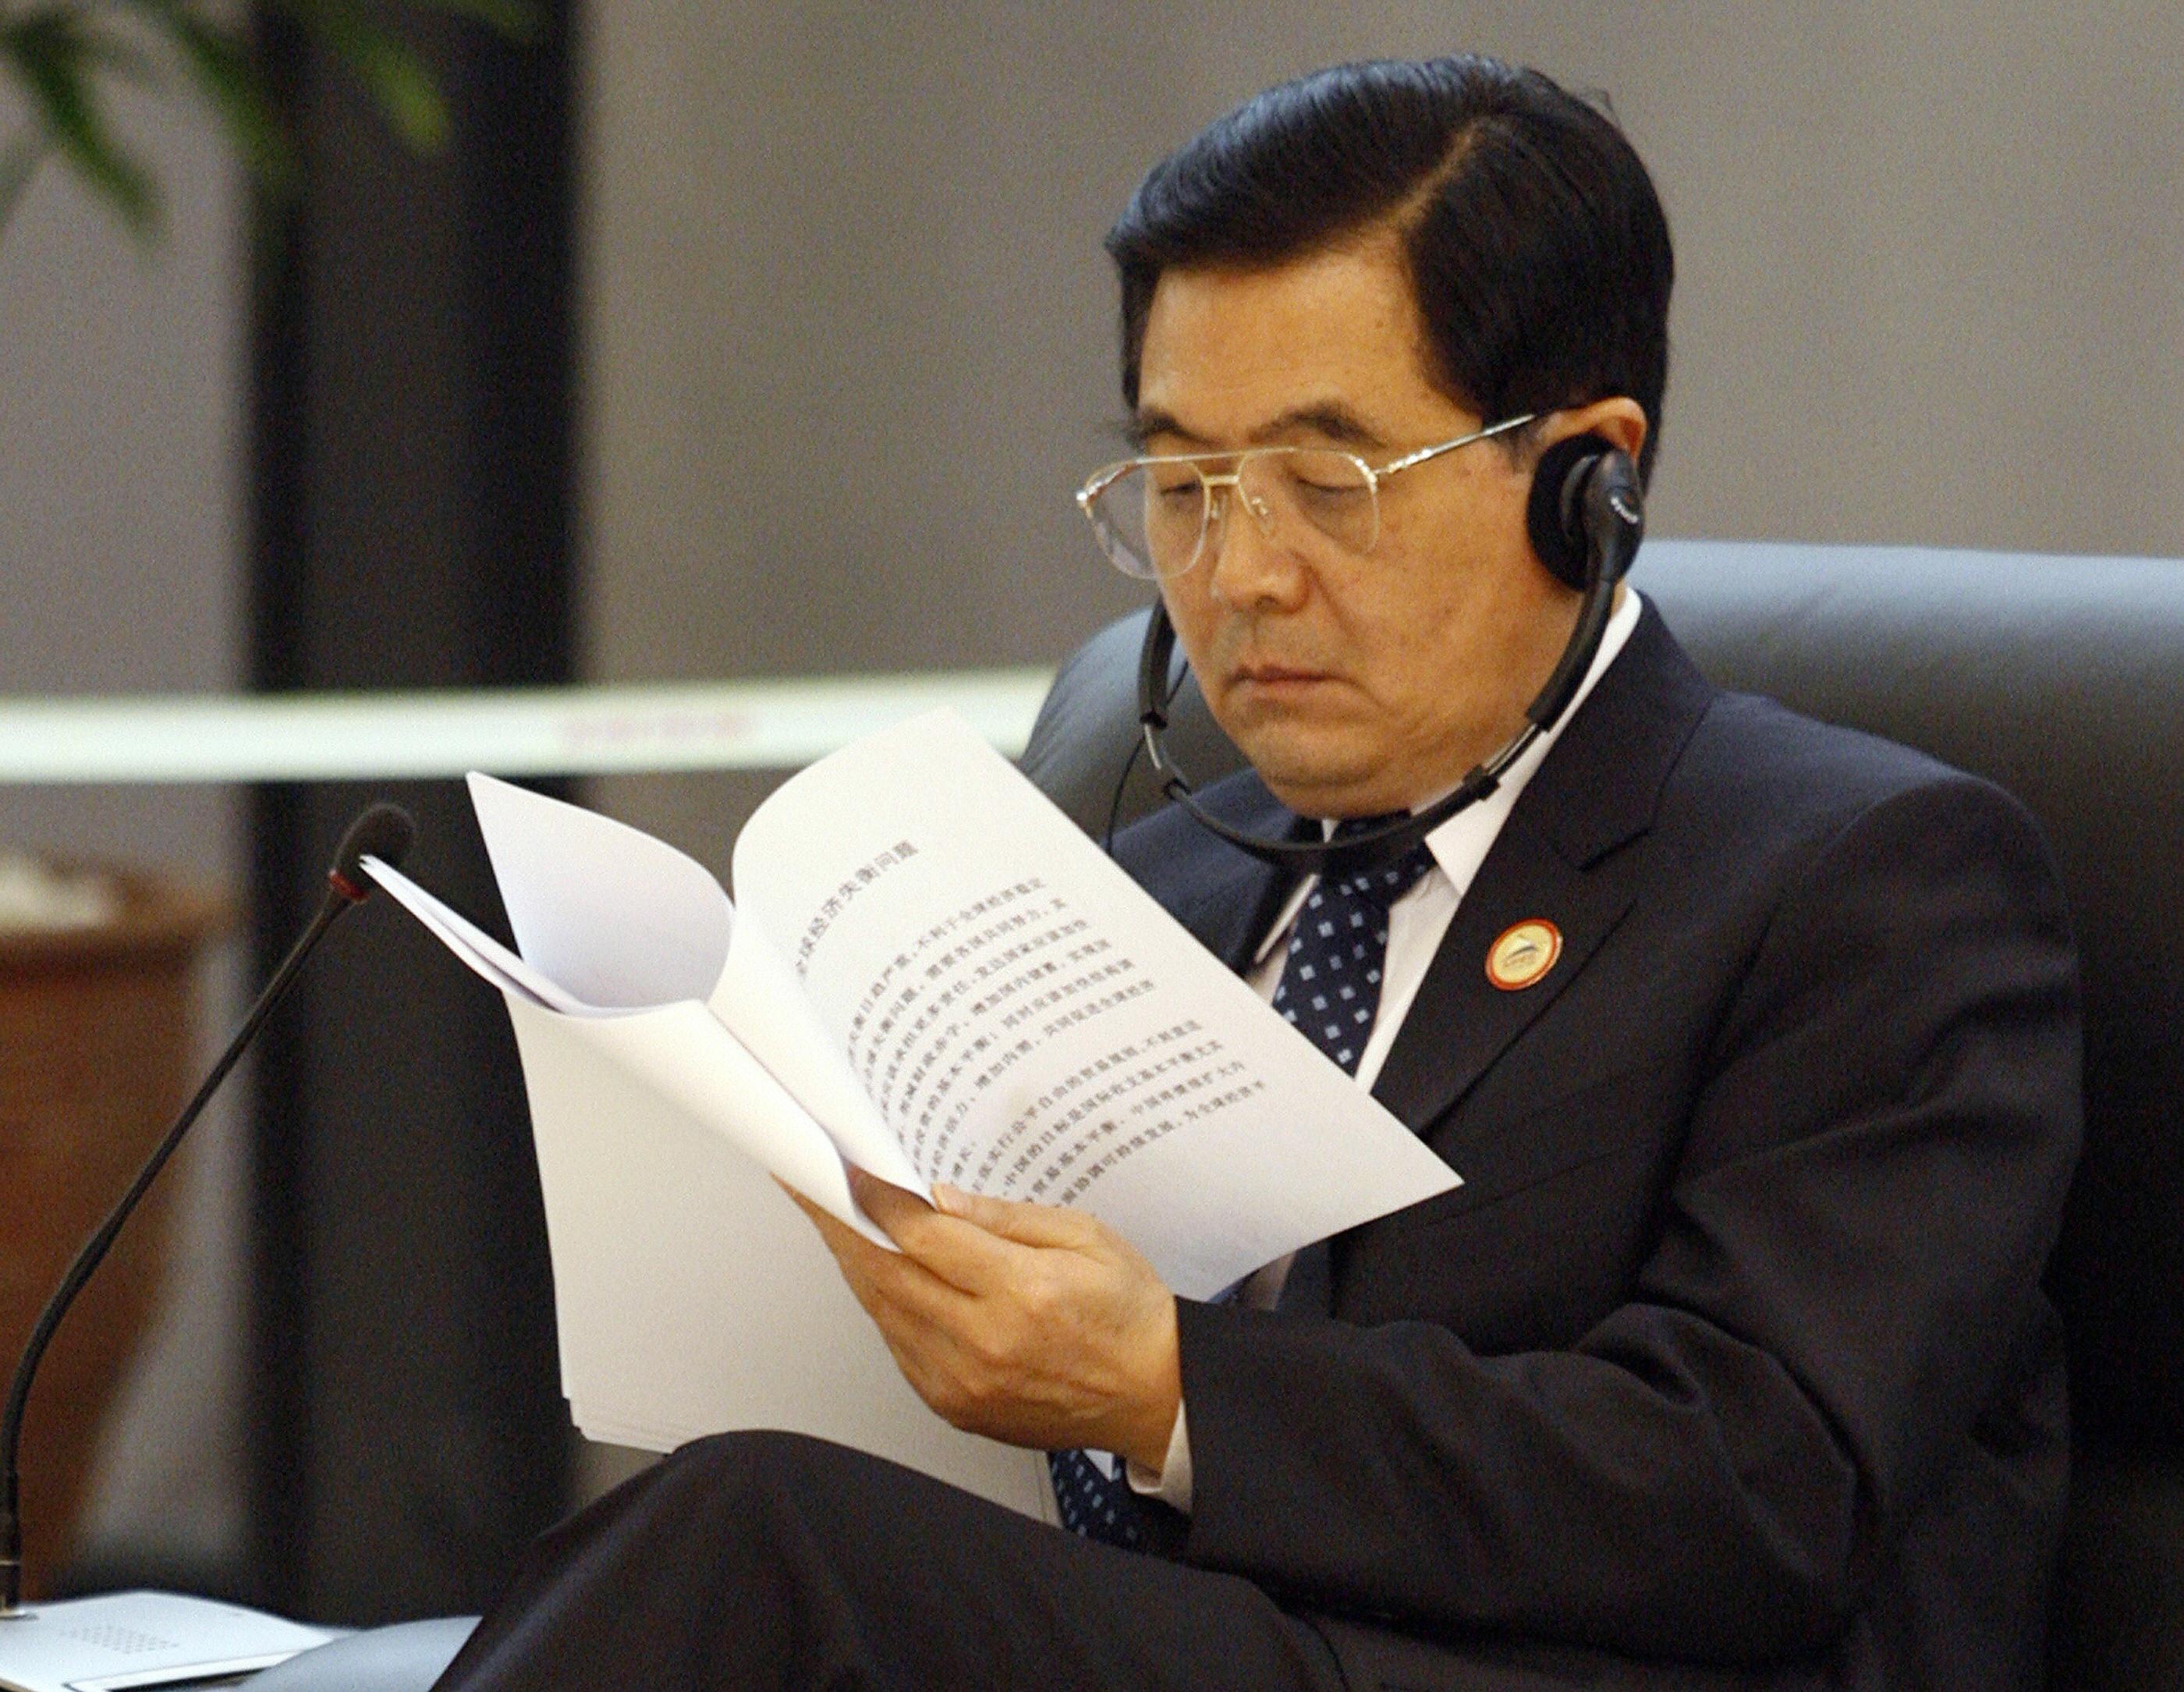 APEC 2006: Xu ly khong kheo, mot la phieu bo di la minh cung kho khan hinh anh 9